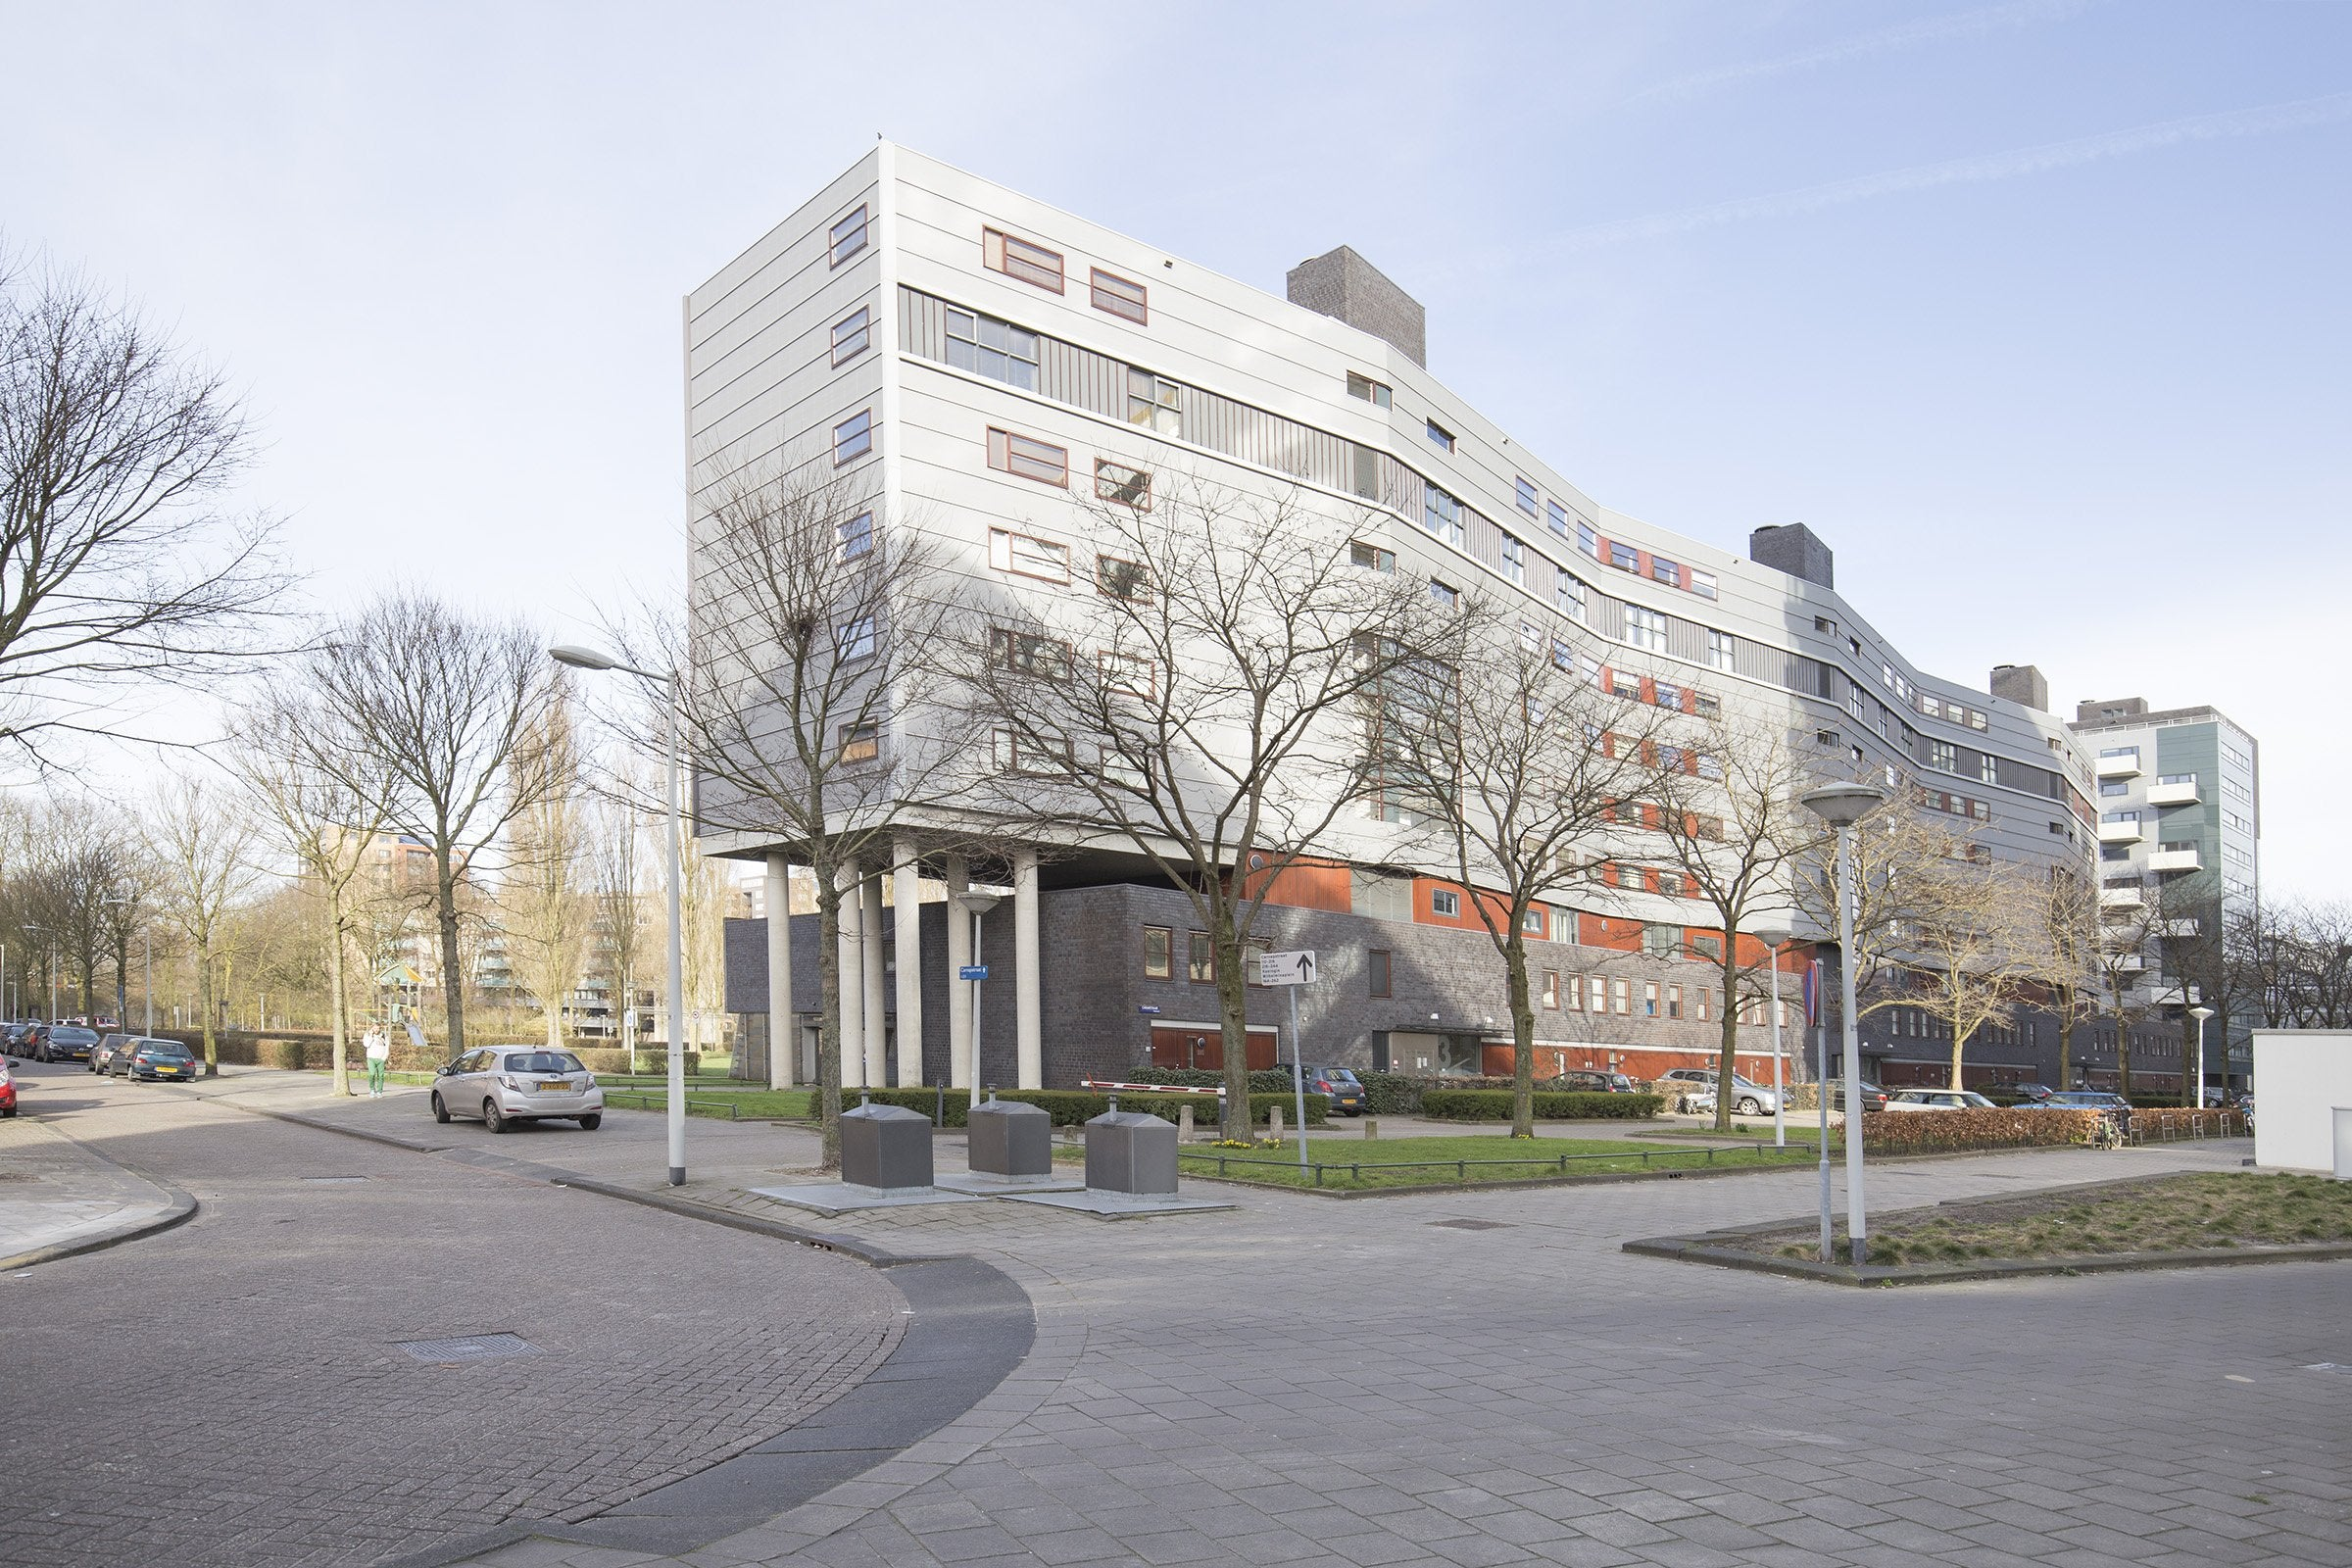 Carnapstraat